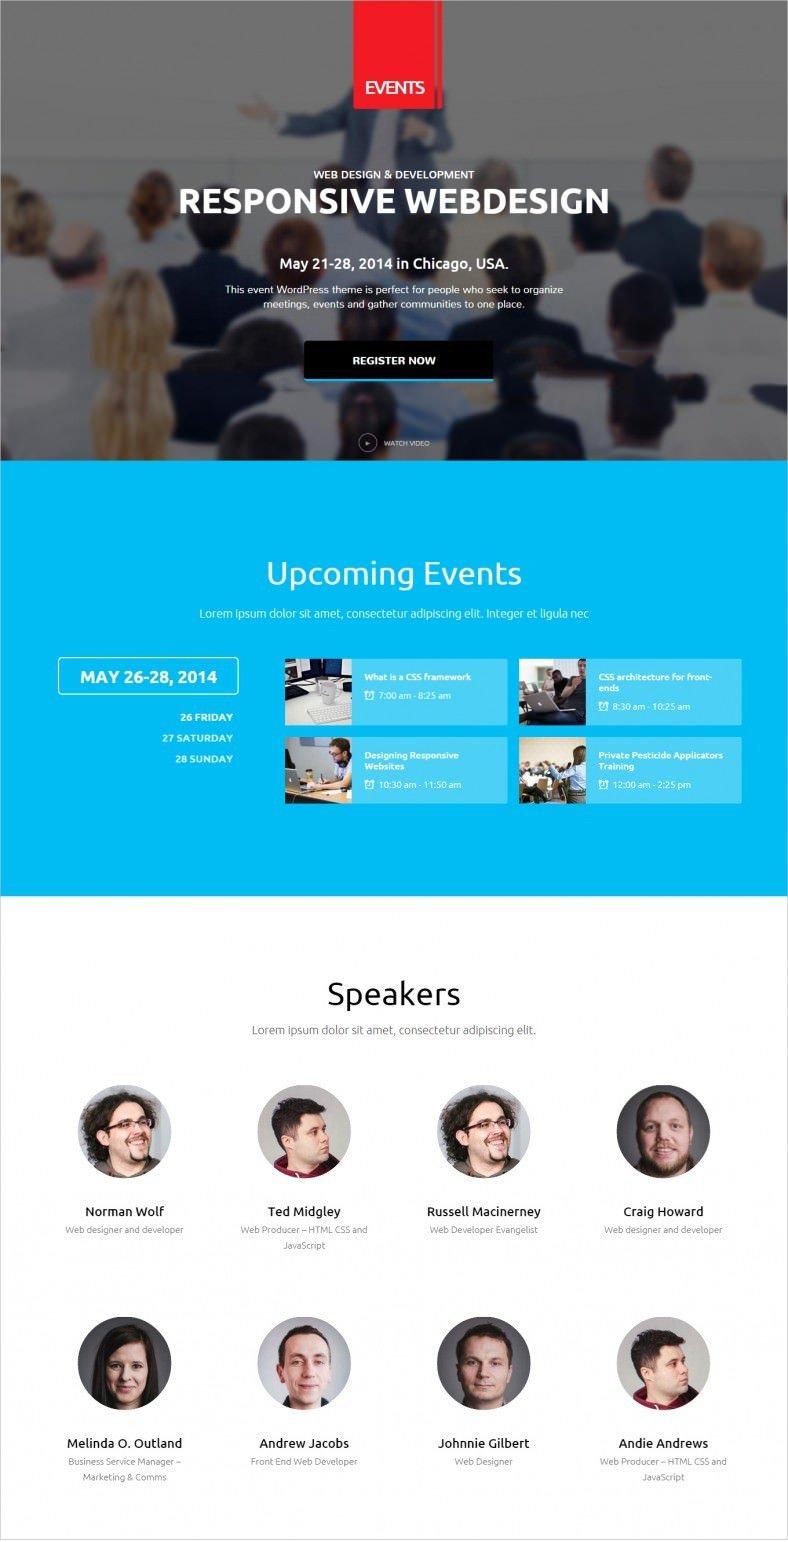 events responsive wordpress template1212525 788x1542